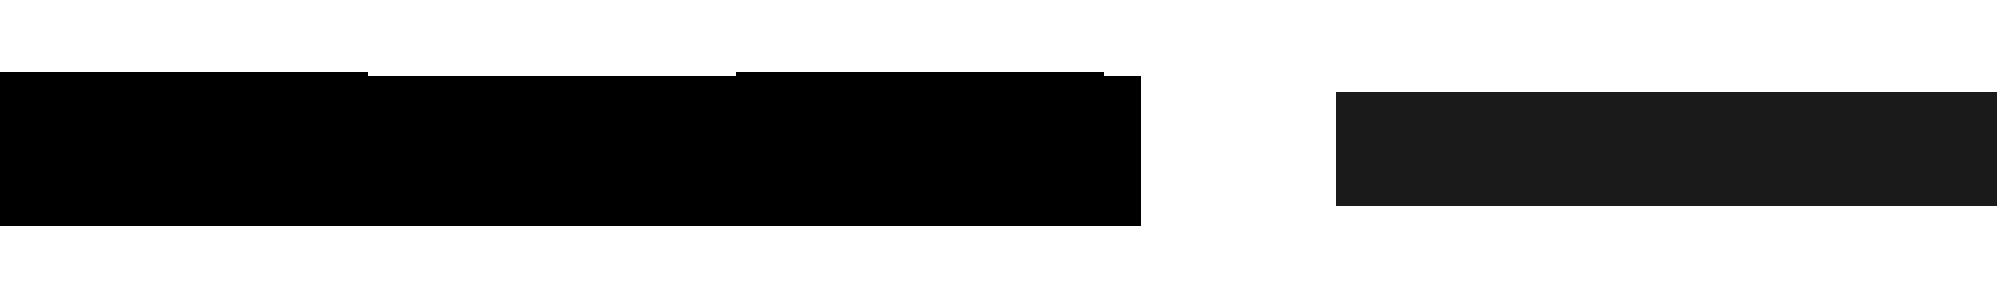 Logos partenaires LJJE